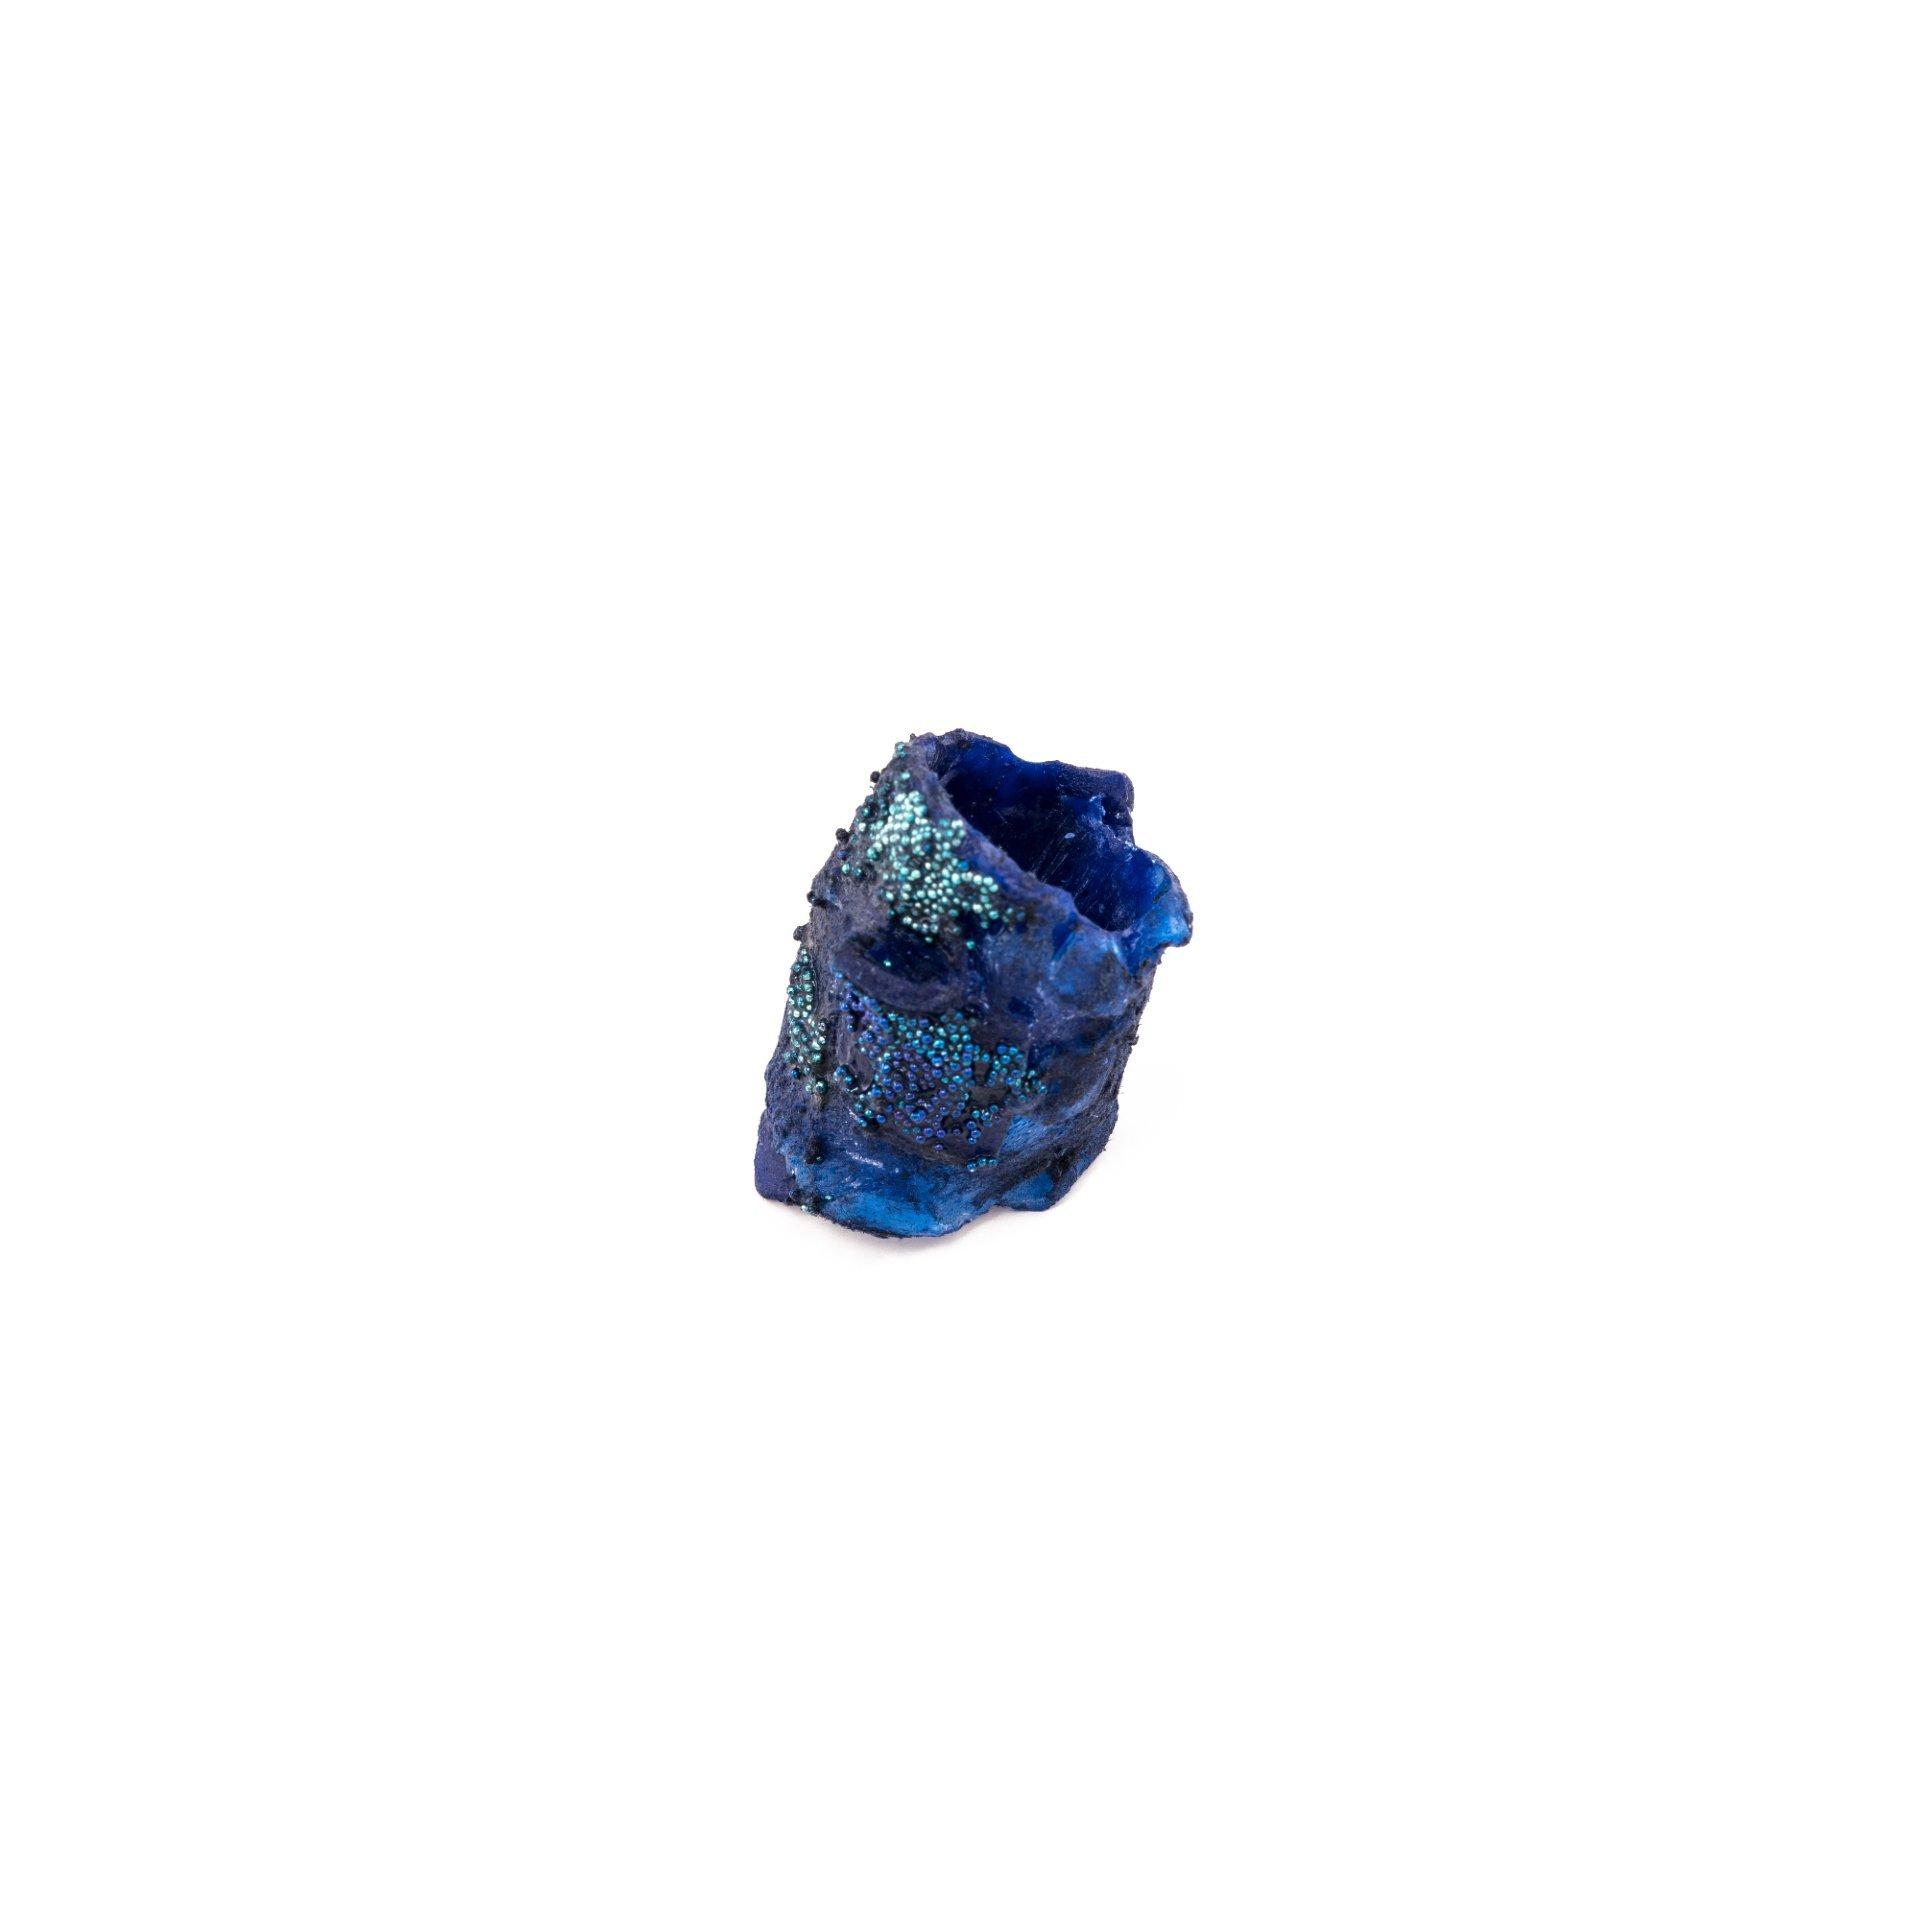 RESIN INTERMEZZO - BLU RING NO.1